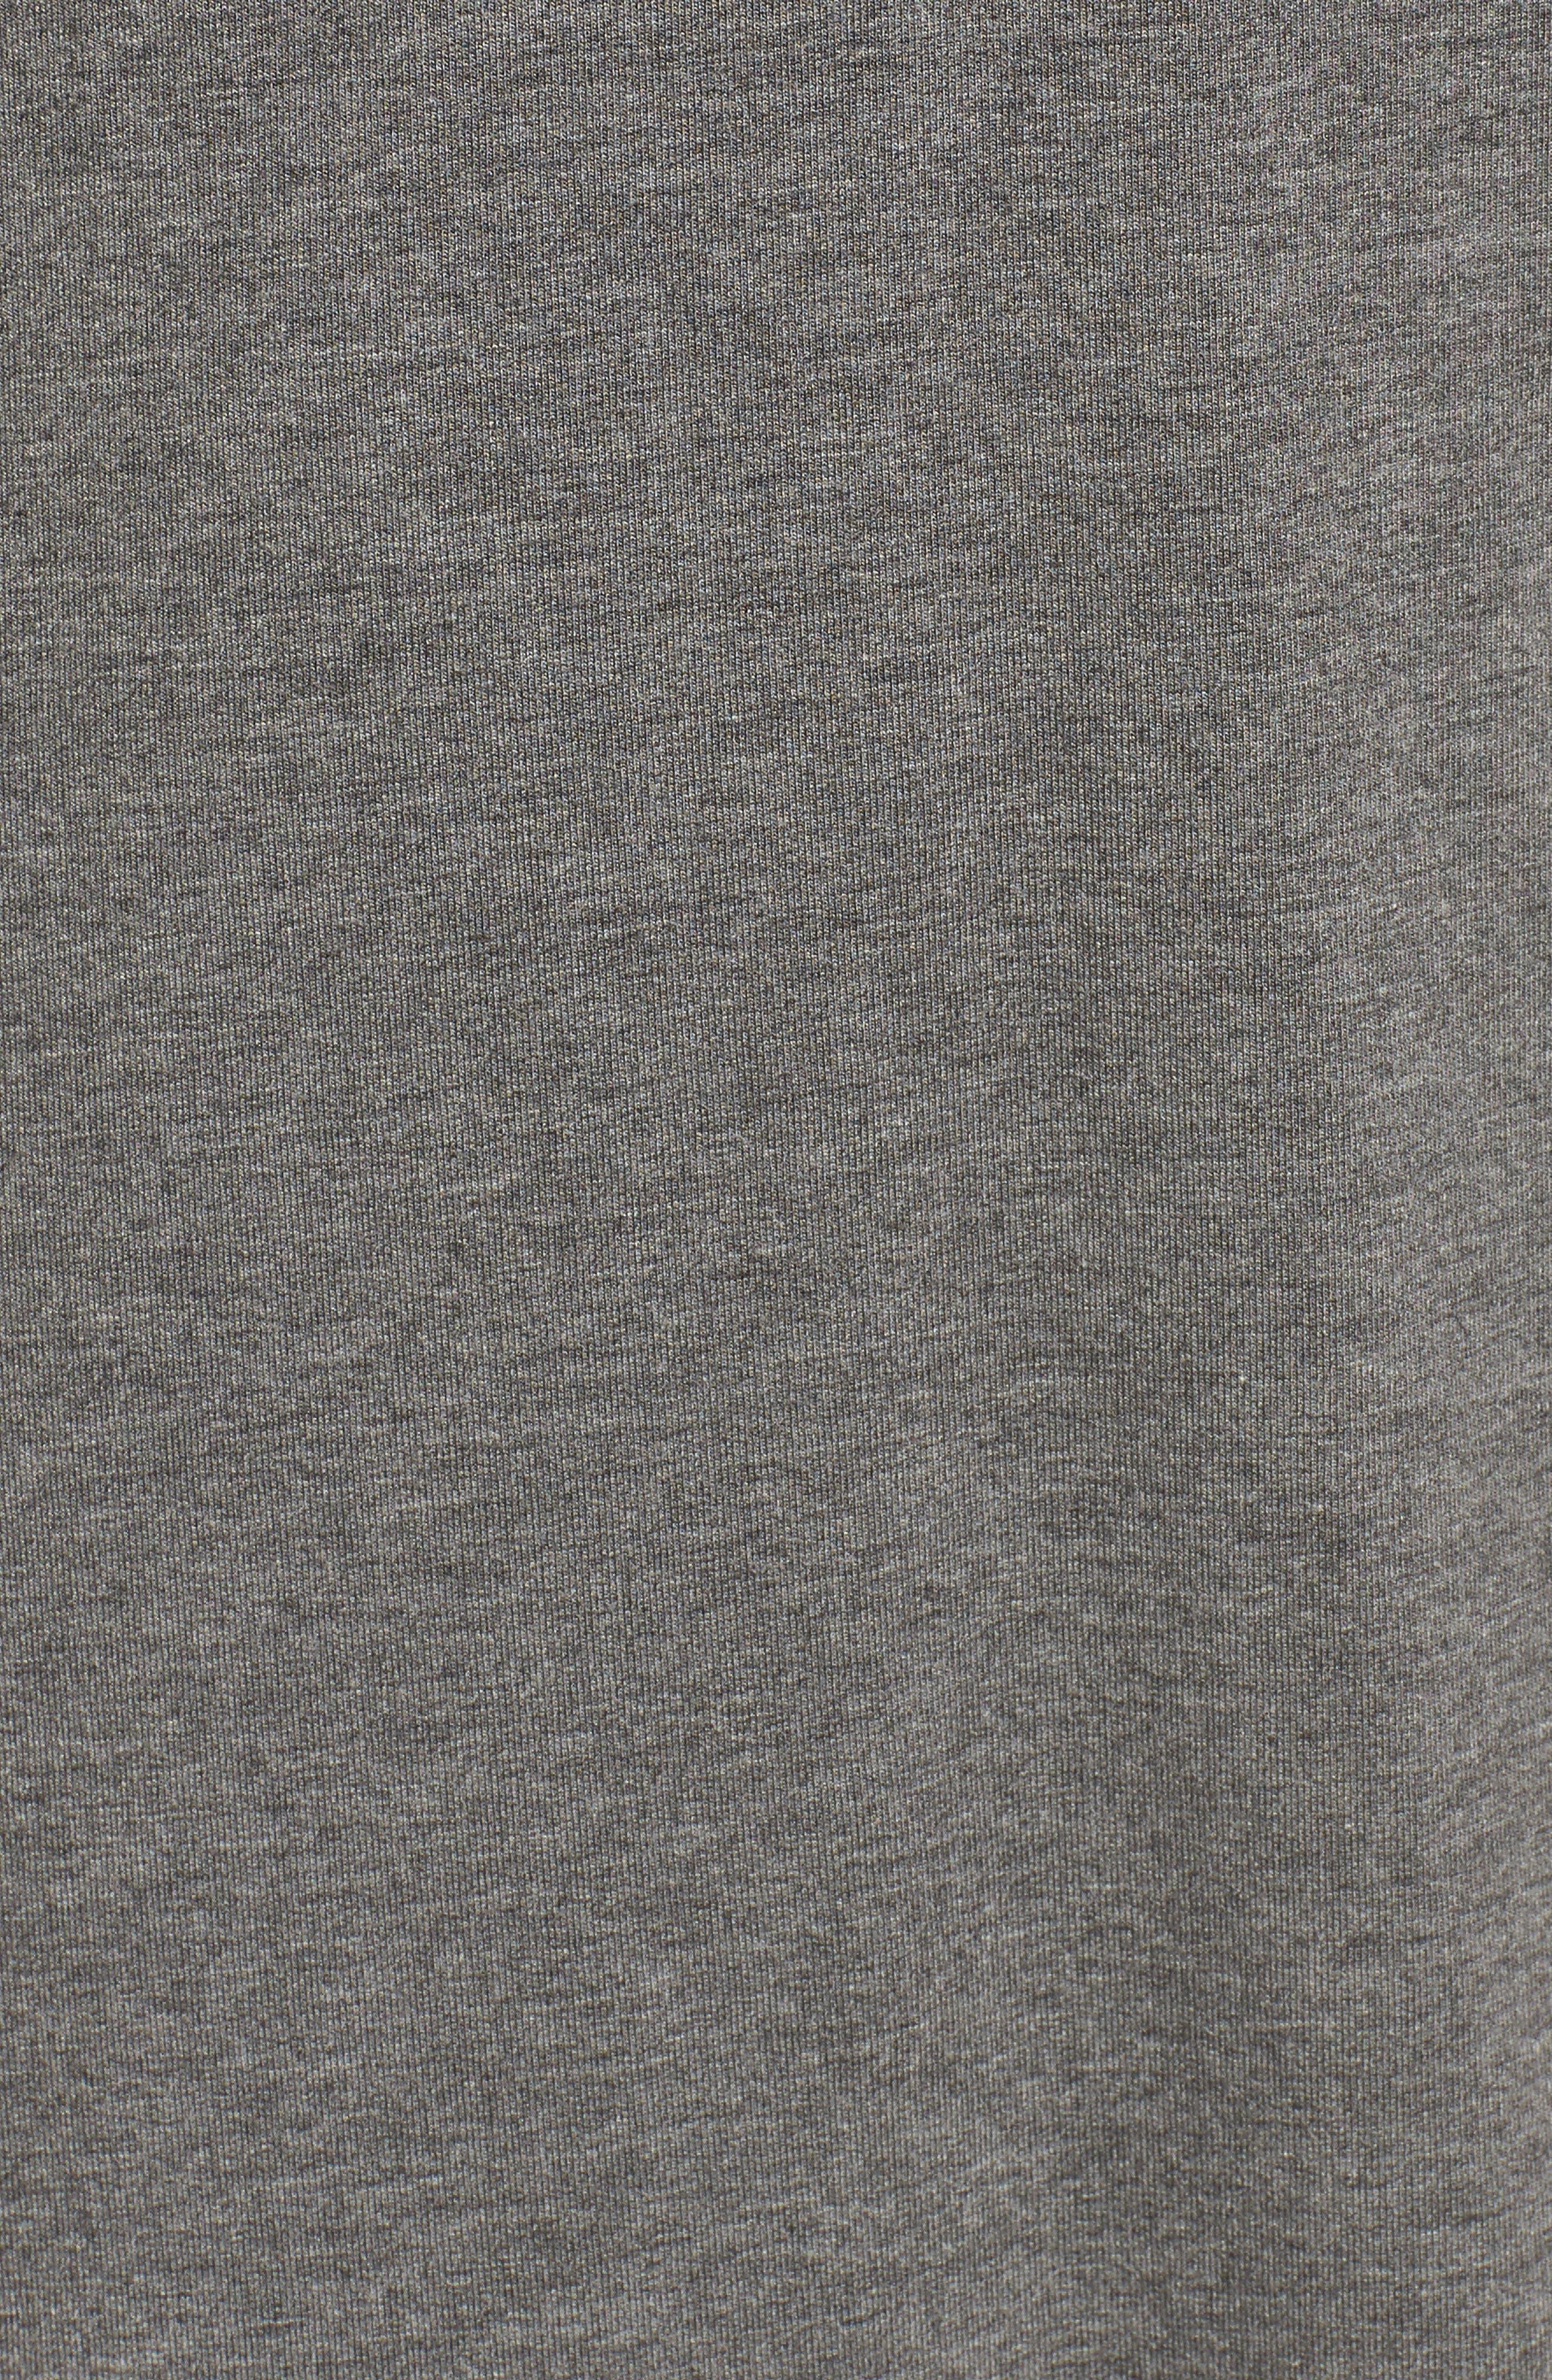 Celerina Lace-Up Minidress,                             Alternate thumbnail 5, color,                             Med Heather Grey